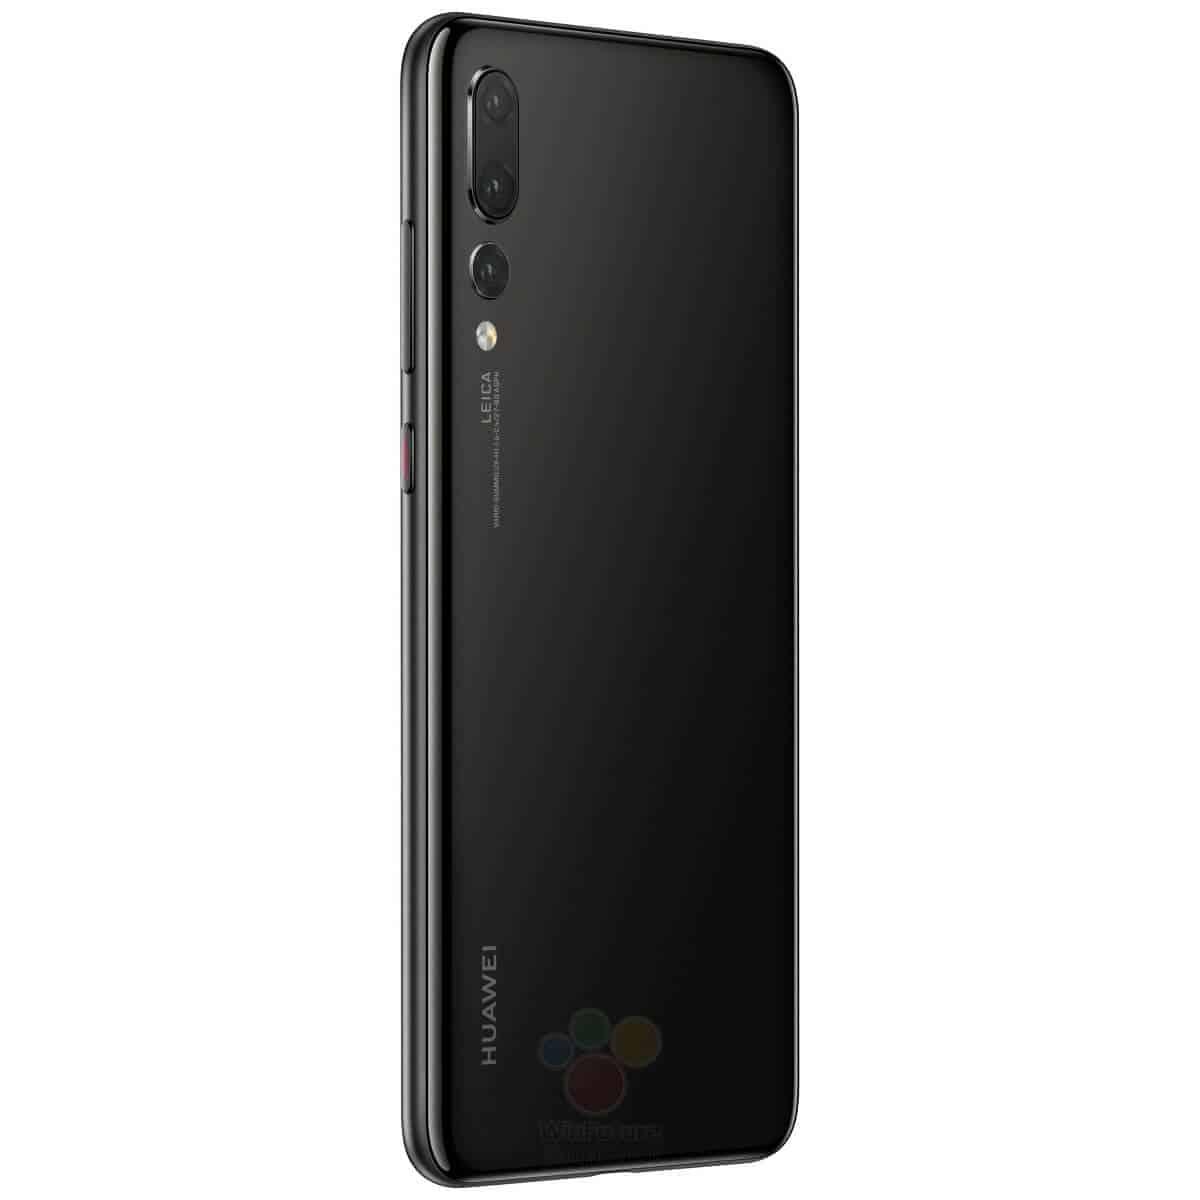 Huawei P20 Pro Press Renders 8